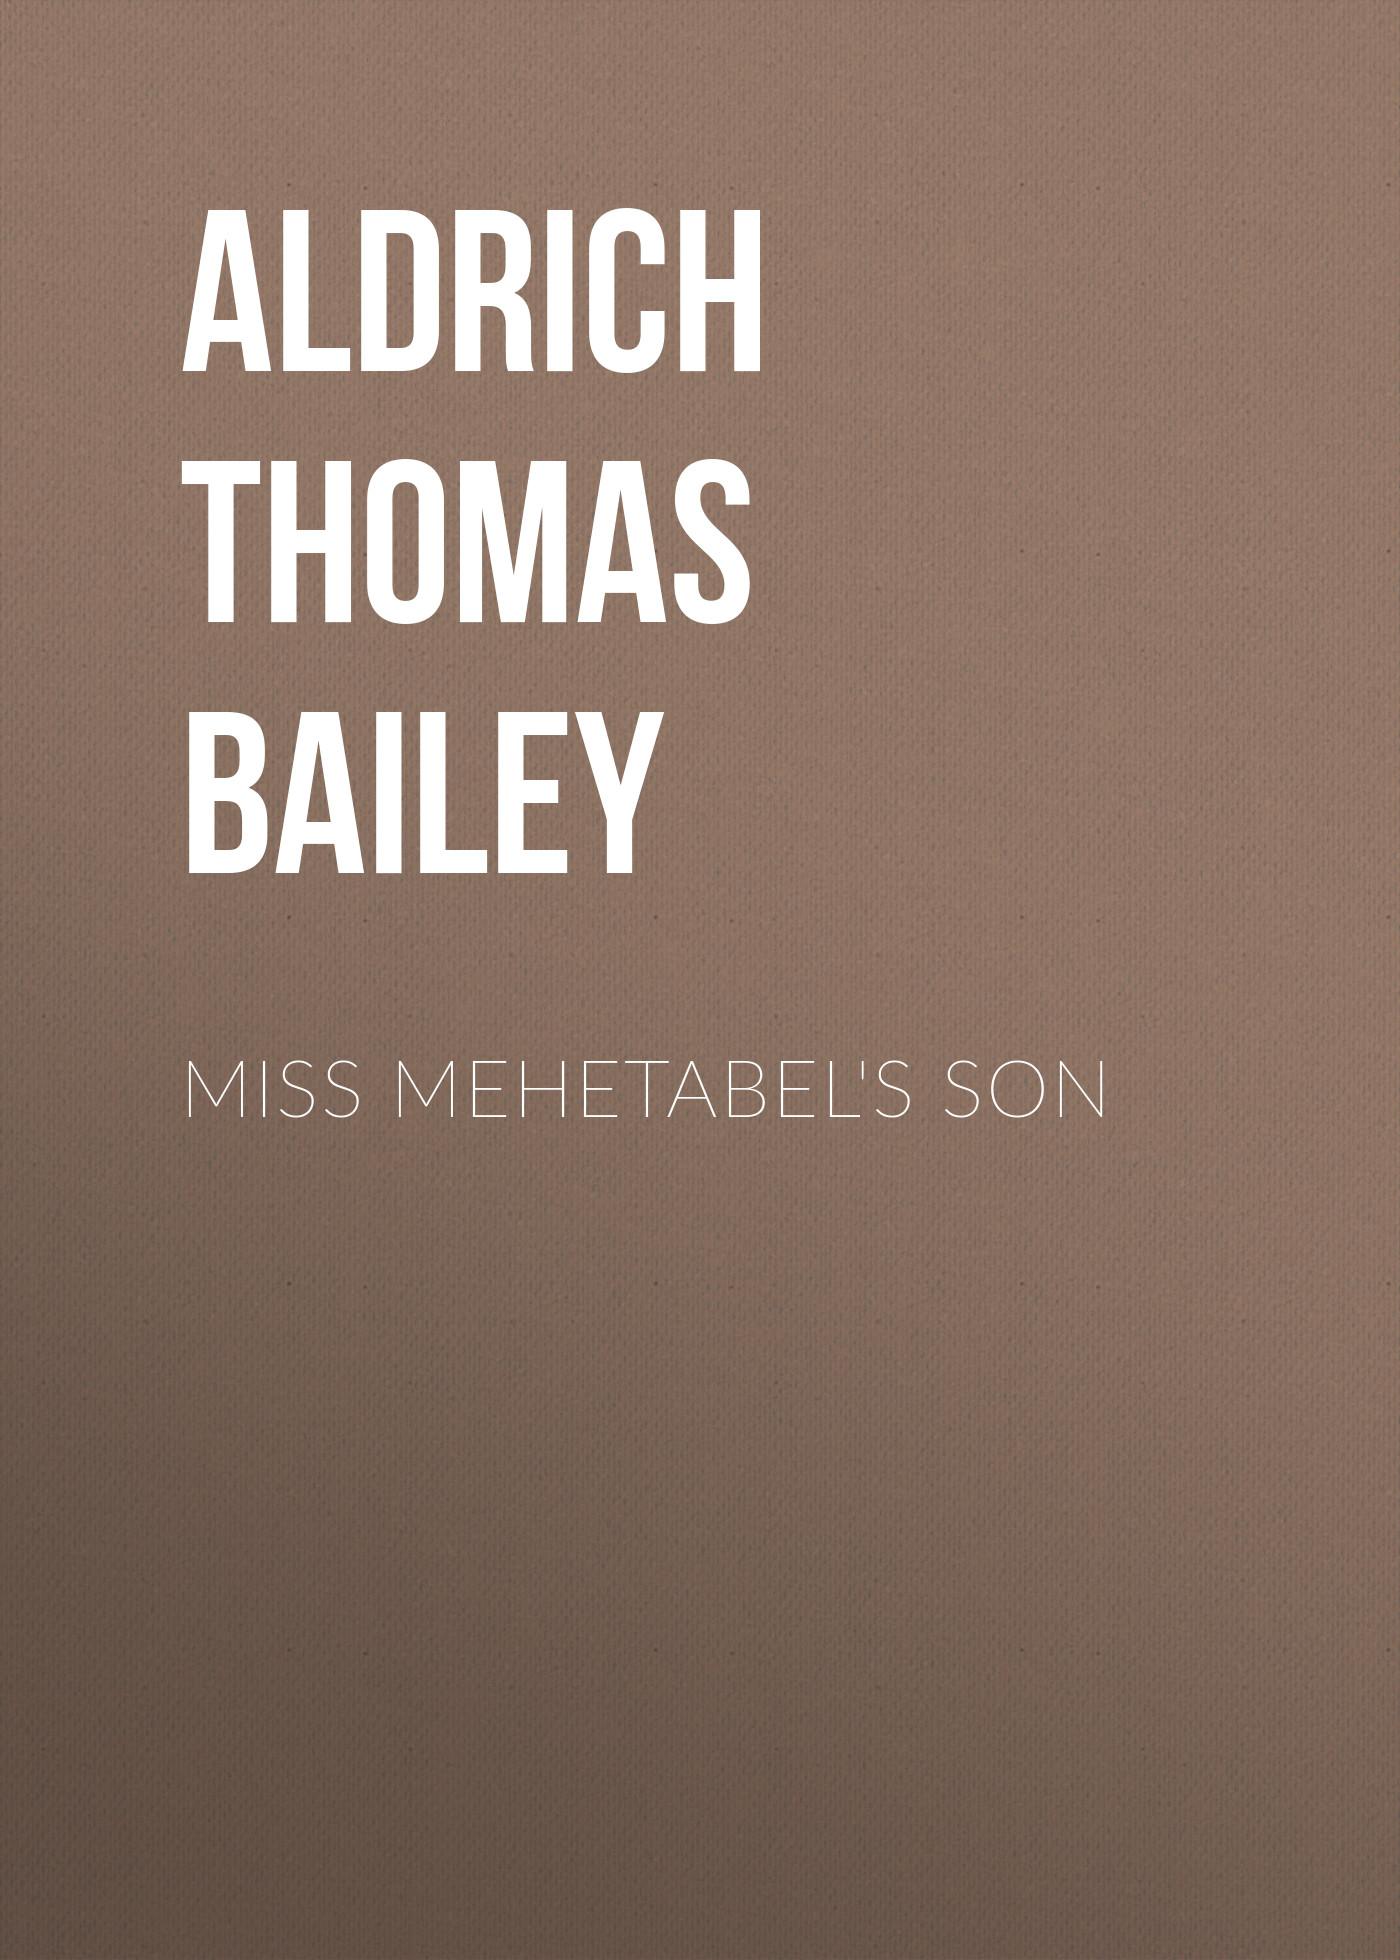 Aldrich Thomas Bailey Miss Mehetabel's Son ronnie aldrich ronnie aldrich orchestra that aldrich feeling